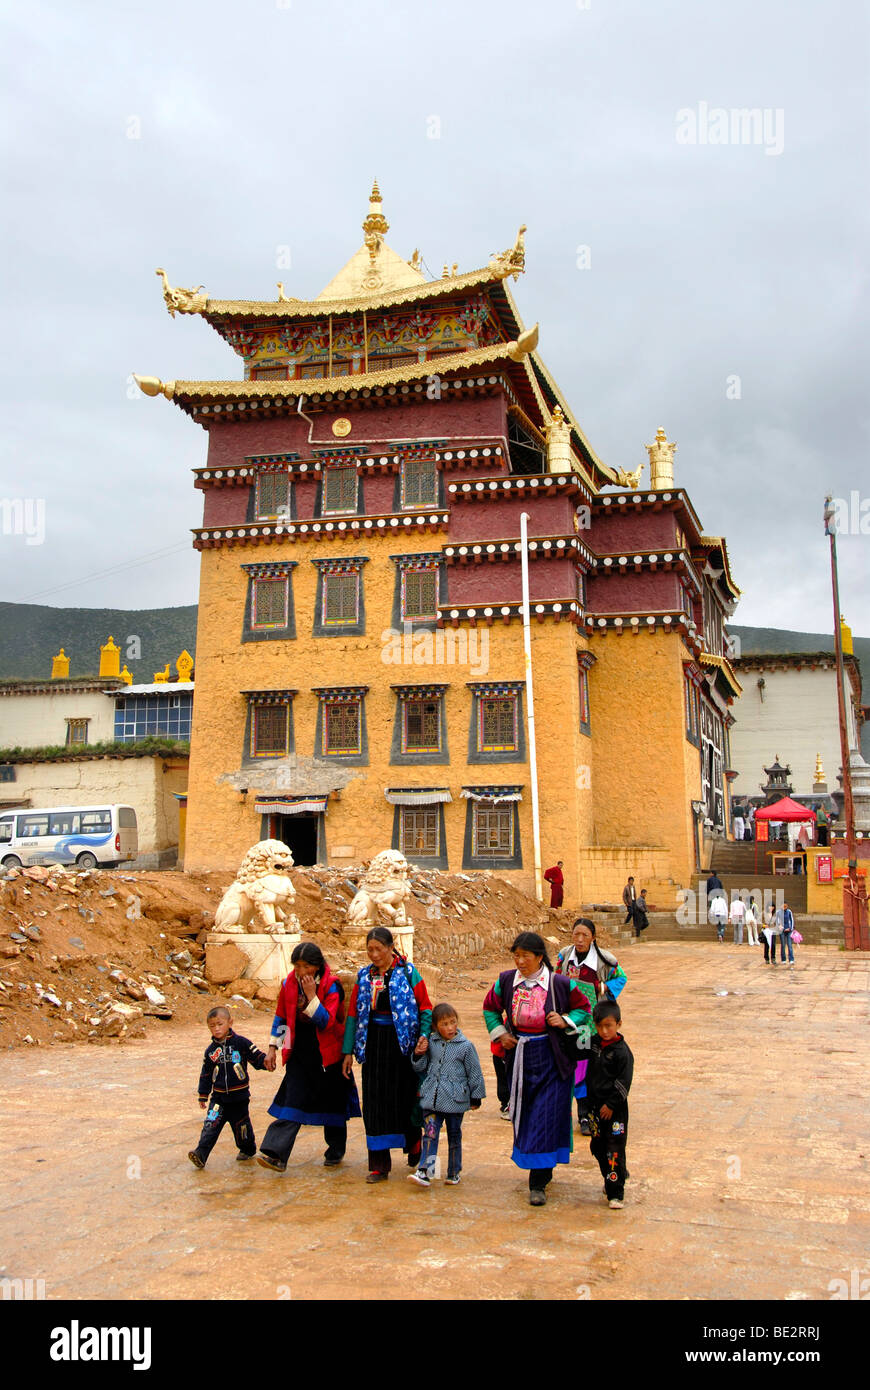 Tibetan Buddhism, Tibetans in front of temple, Monastery Ganden Sumtseling Gompa, Zhongdian, Shangri-La, Yunnan - Stock Image